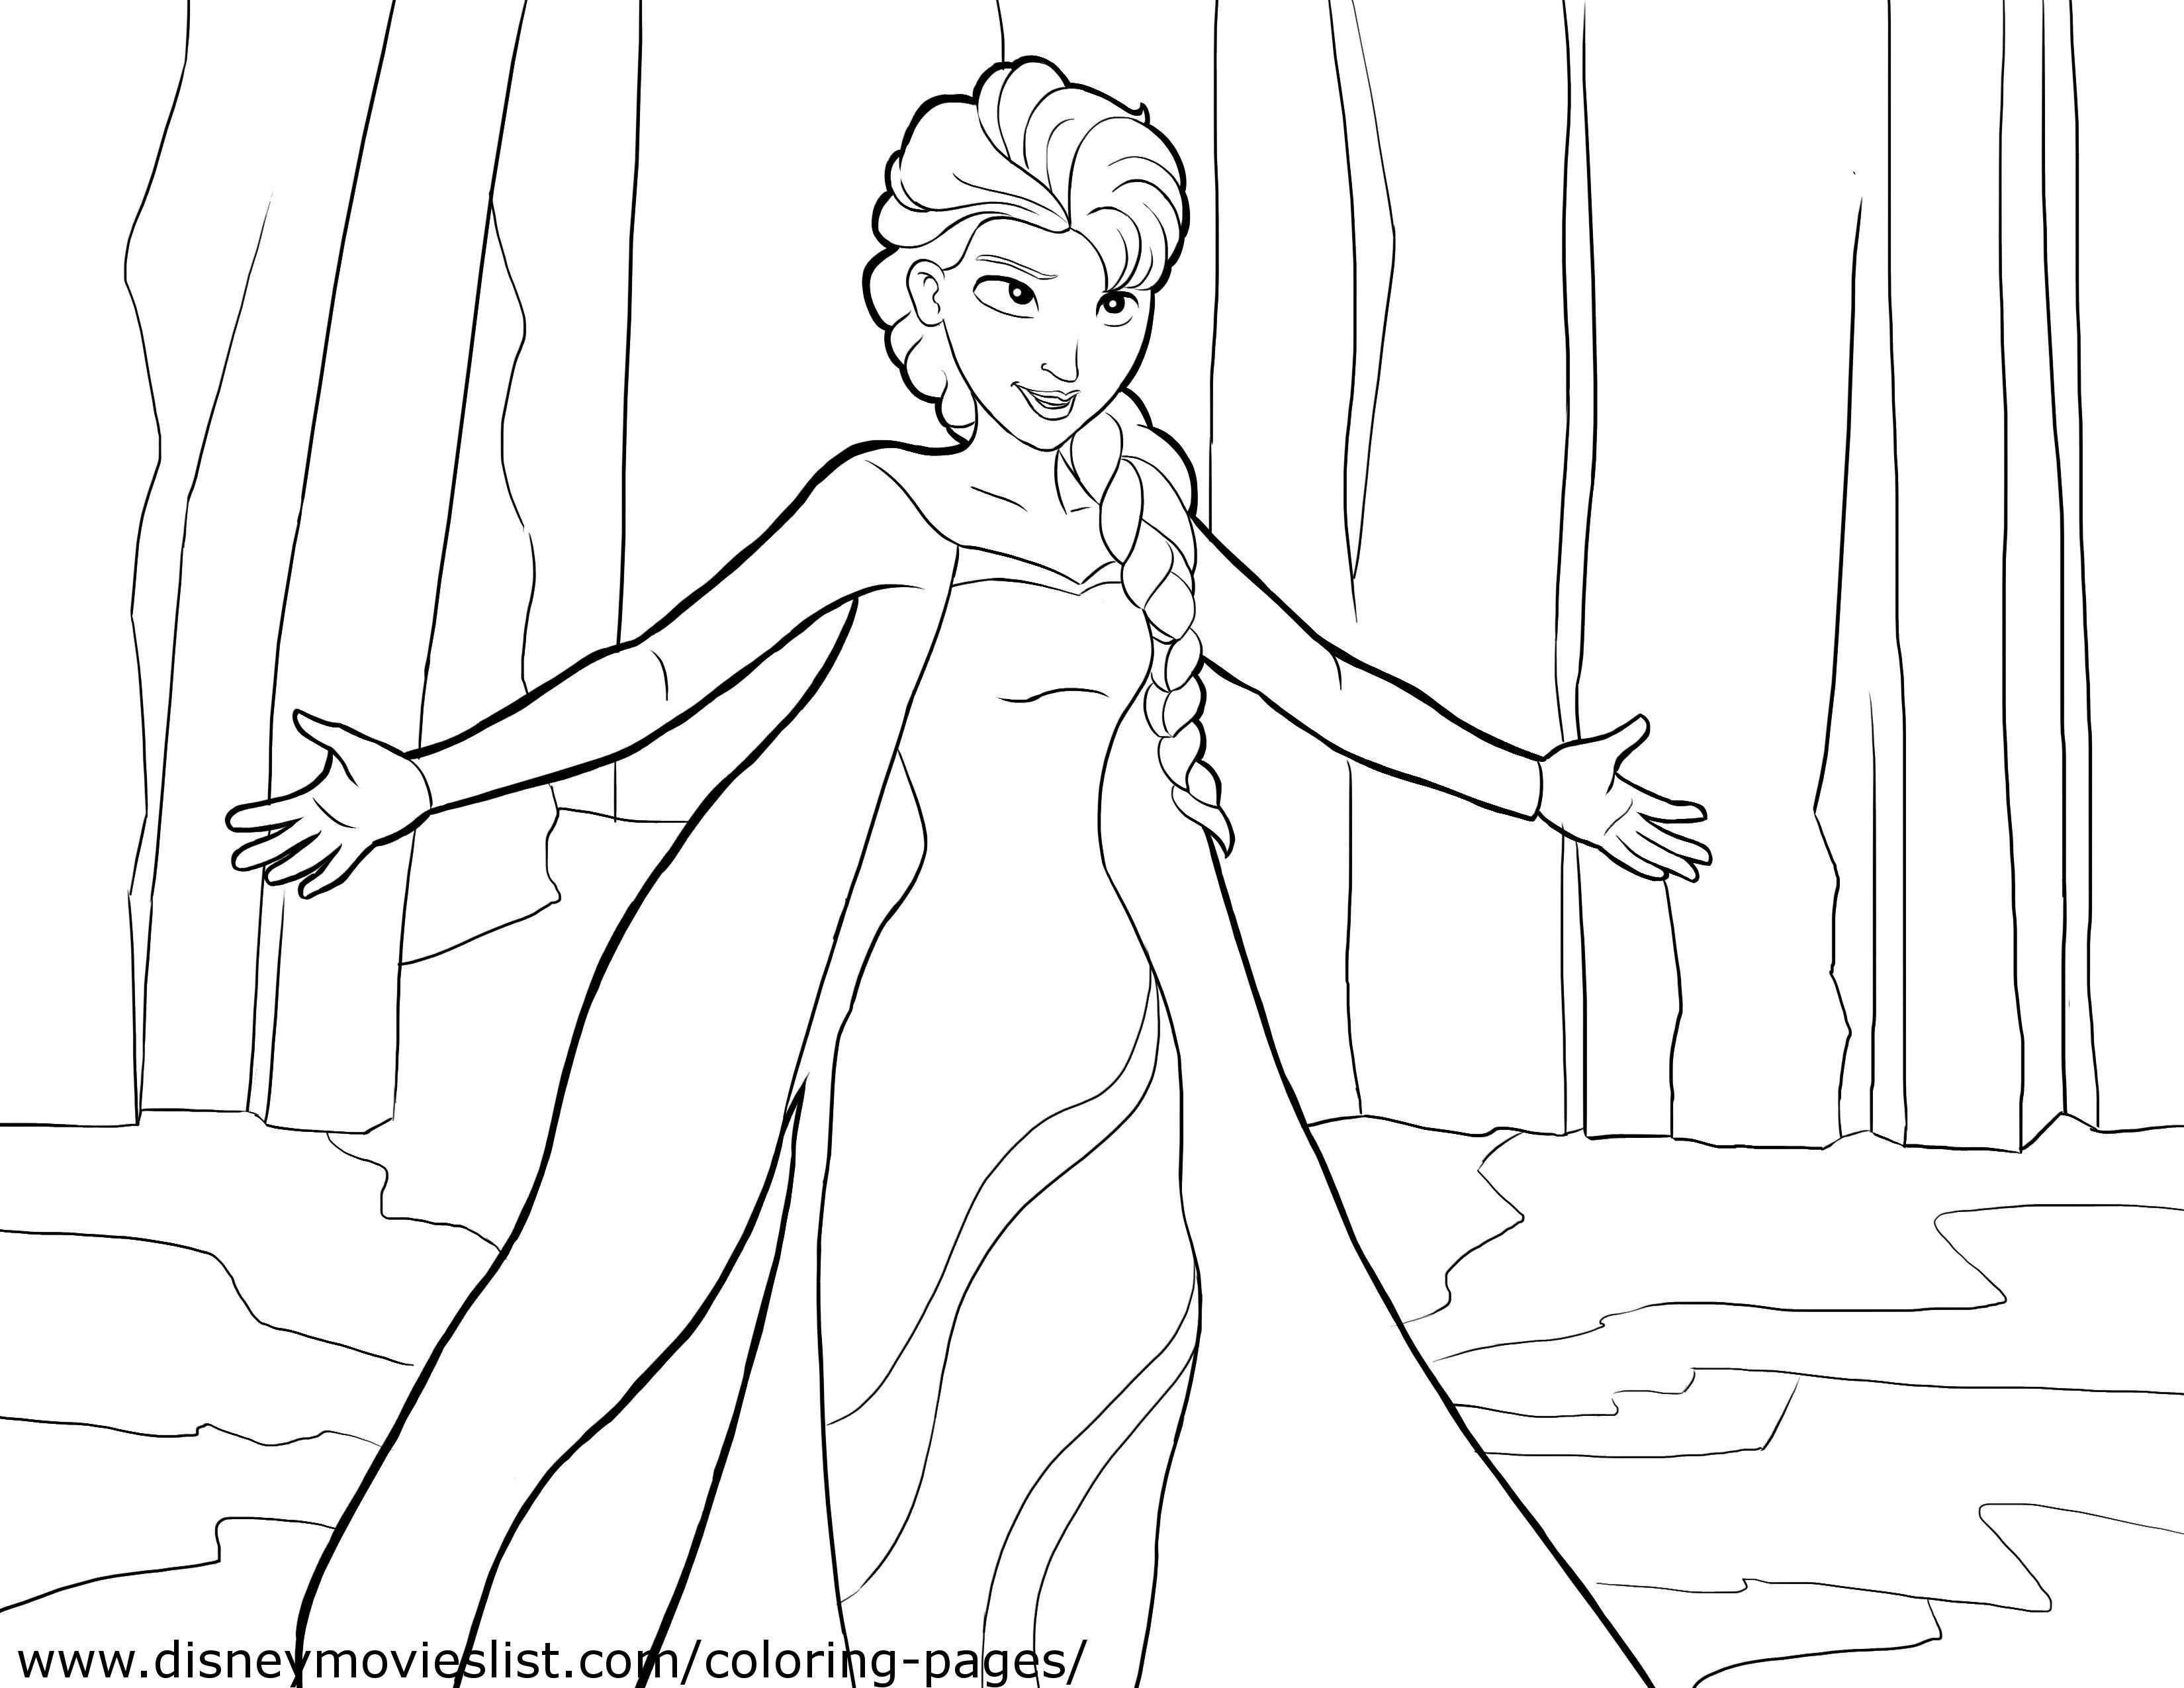 Anna Und Elsa Ausmalbilder Genial Frozen Coloring Pages Pdf Beautiful Elsa and Anna Coloring Book 22 Bild